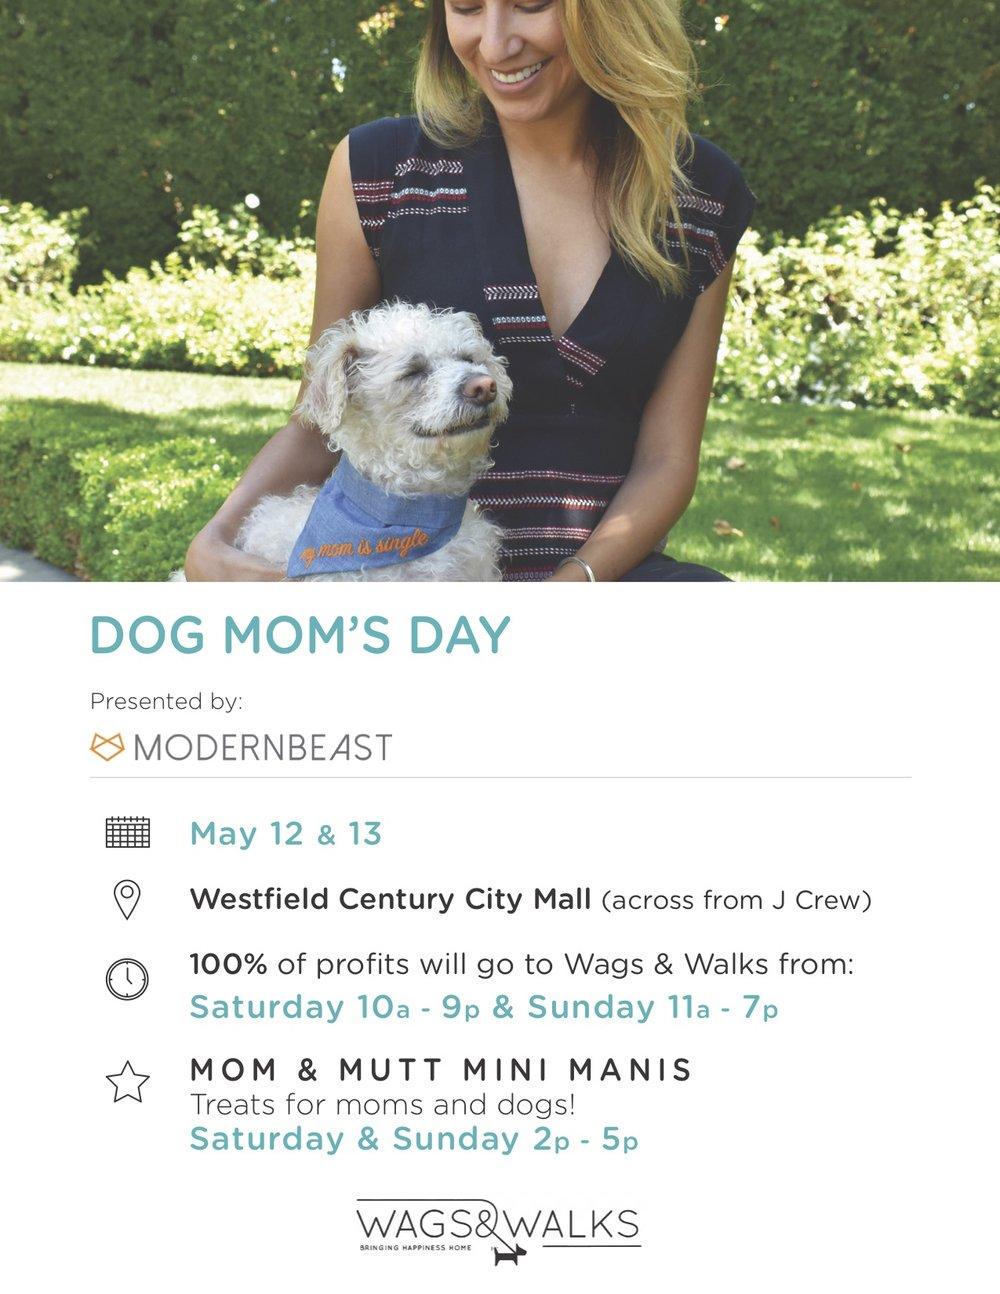 dogsmomsday.jpg